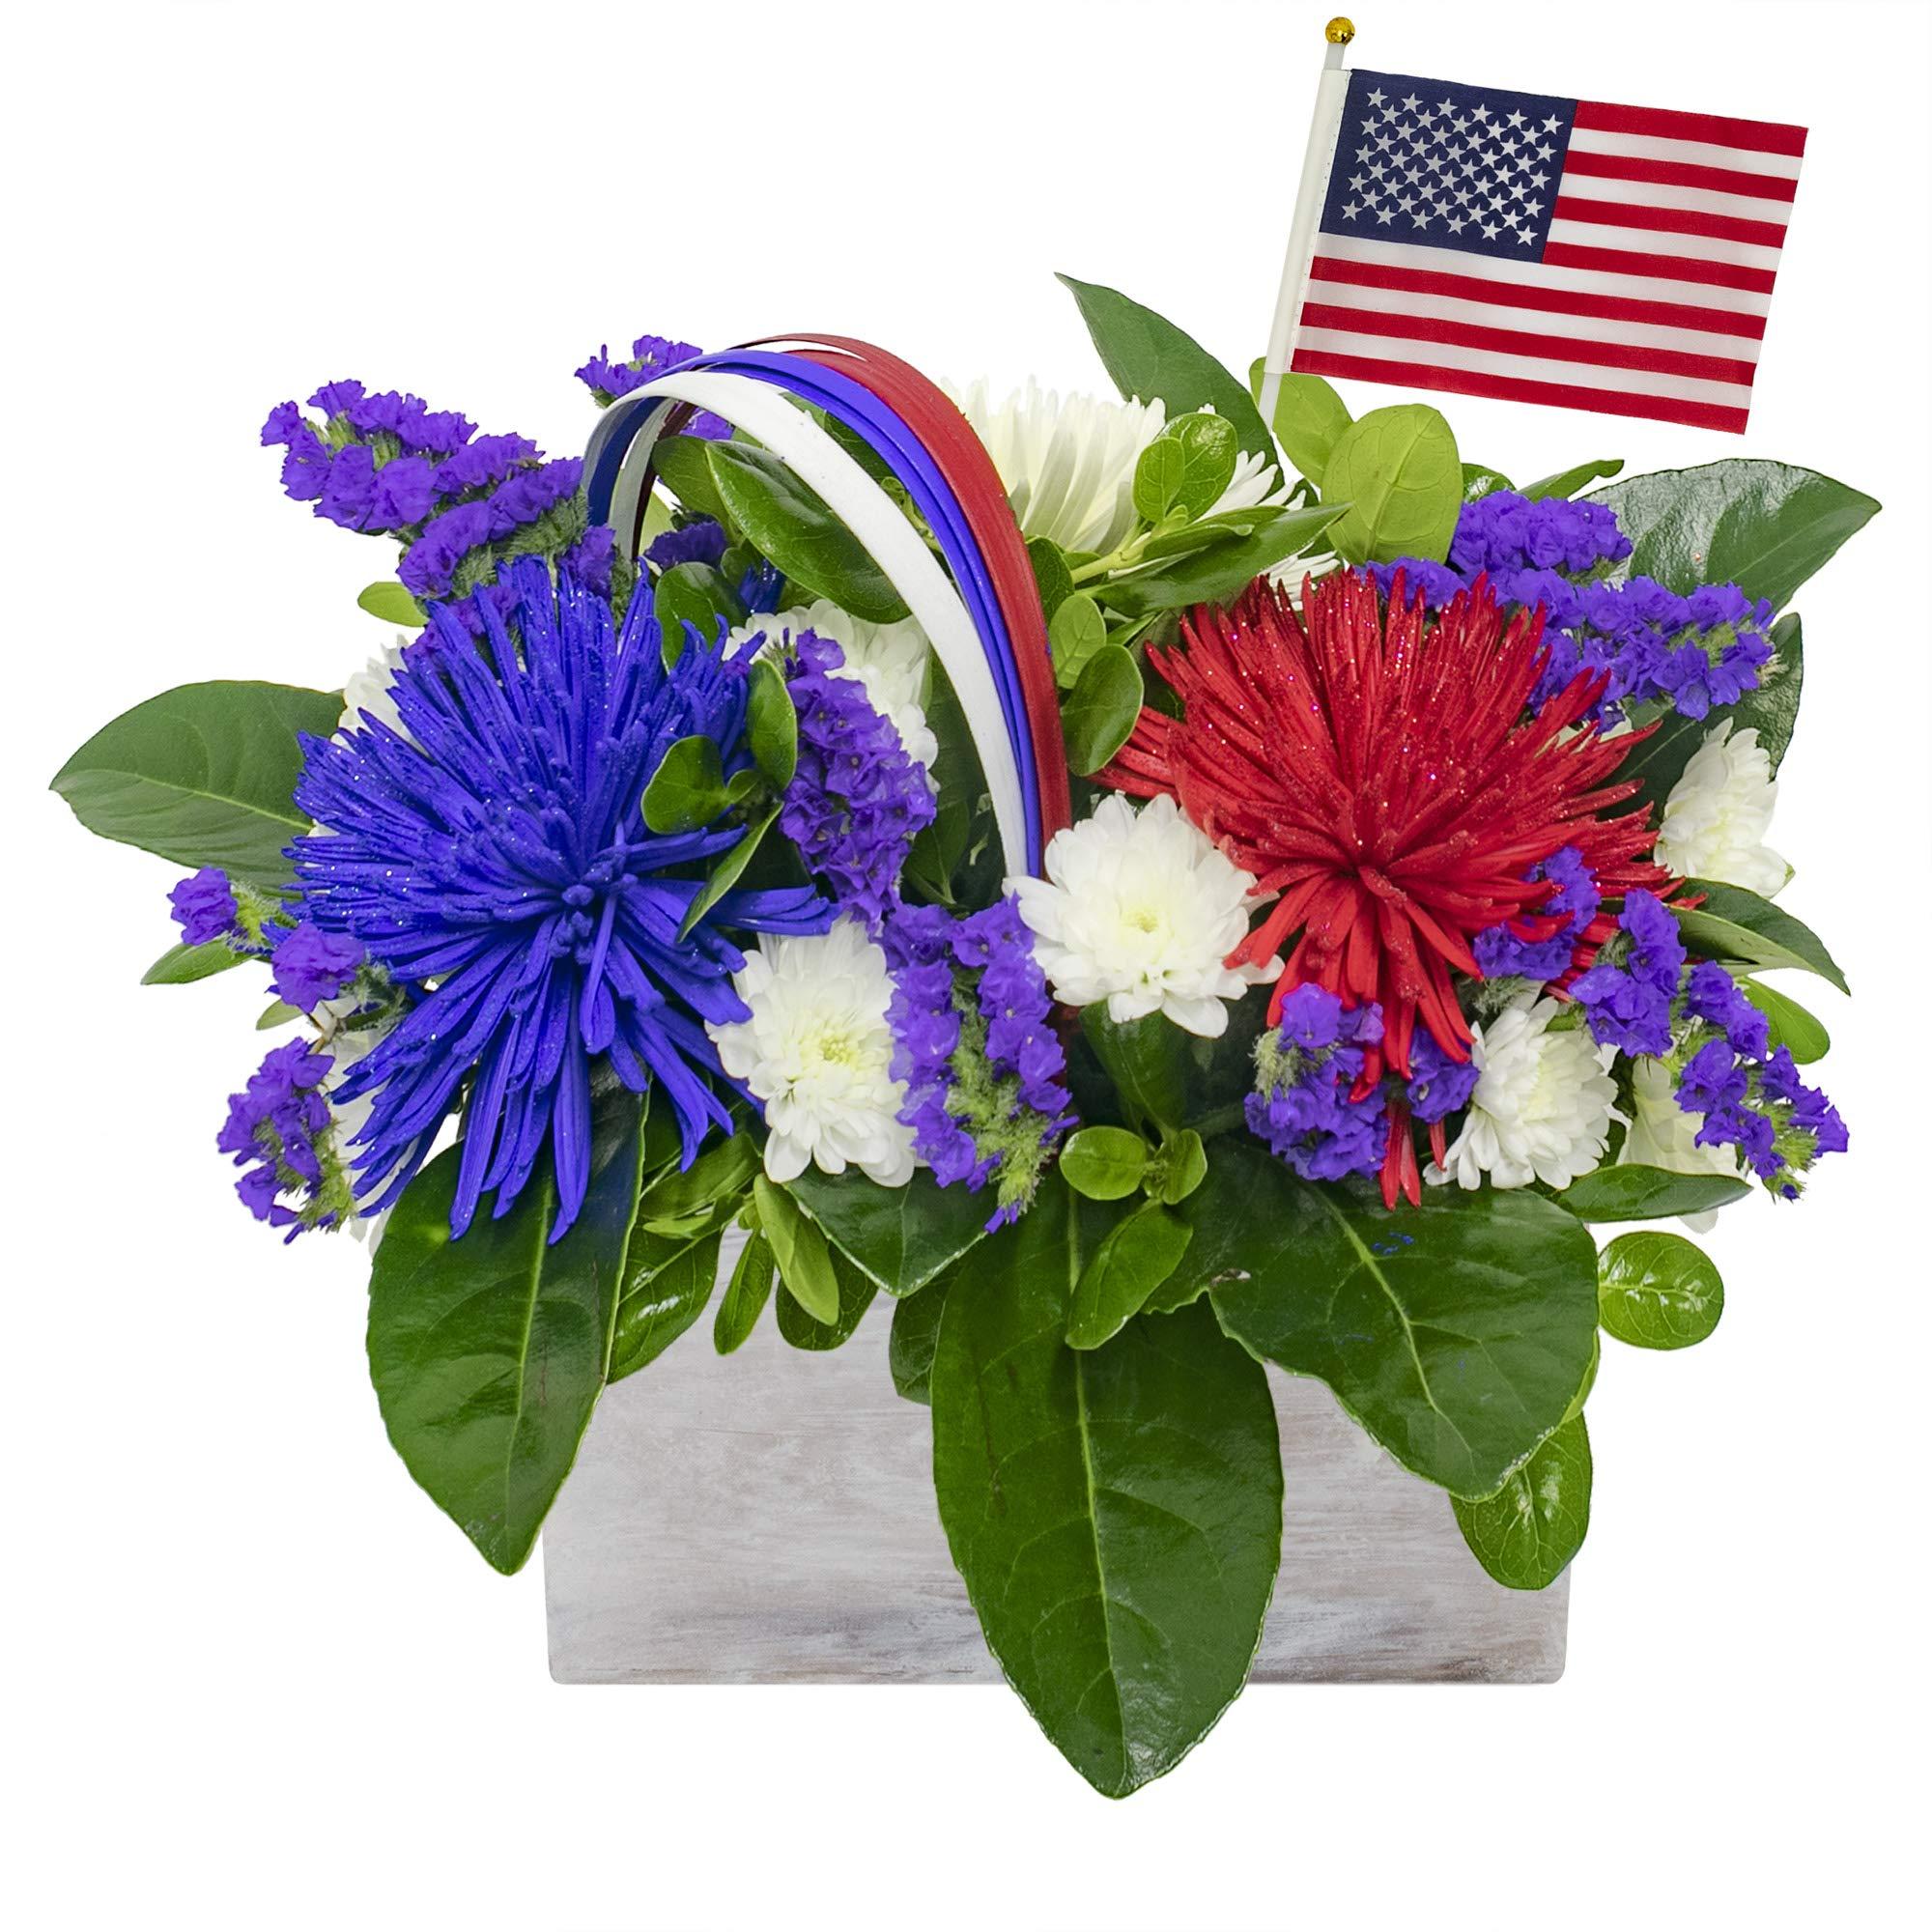 eFlowy - Patriotic Centerpiece Arrangement